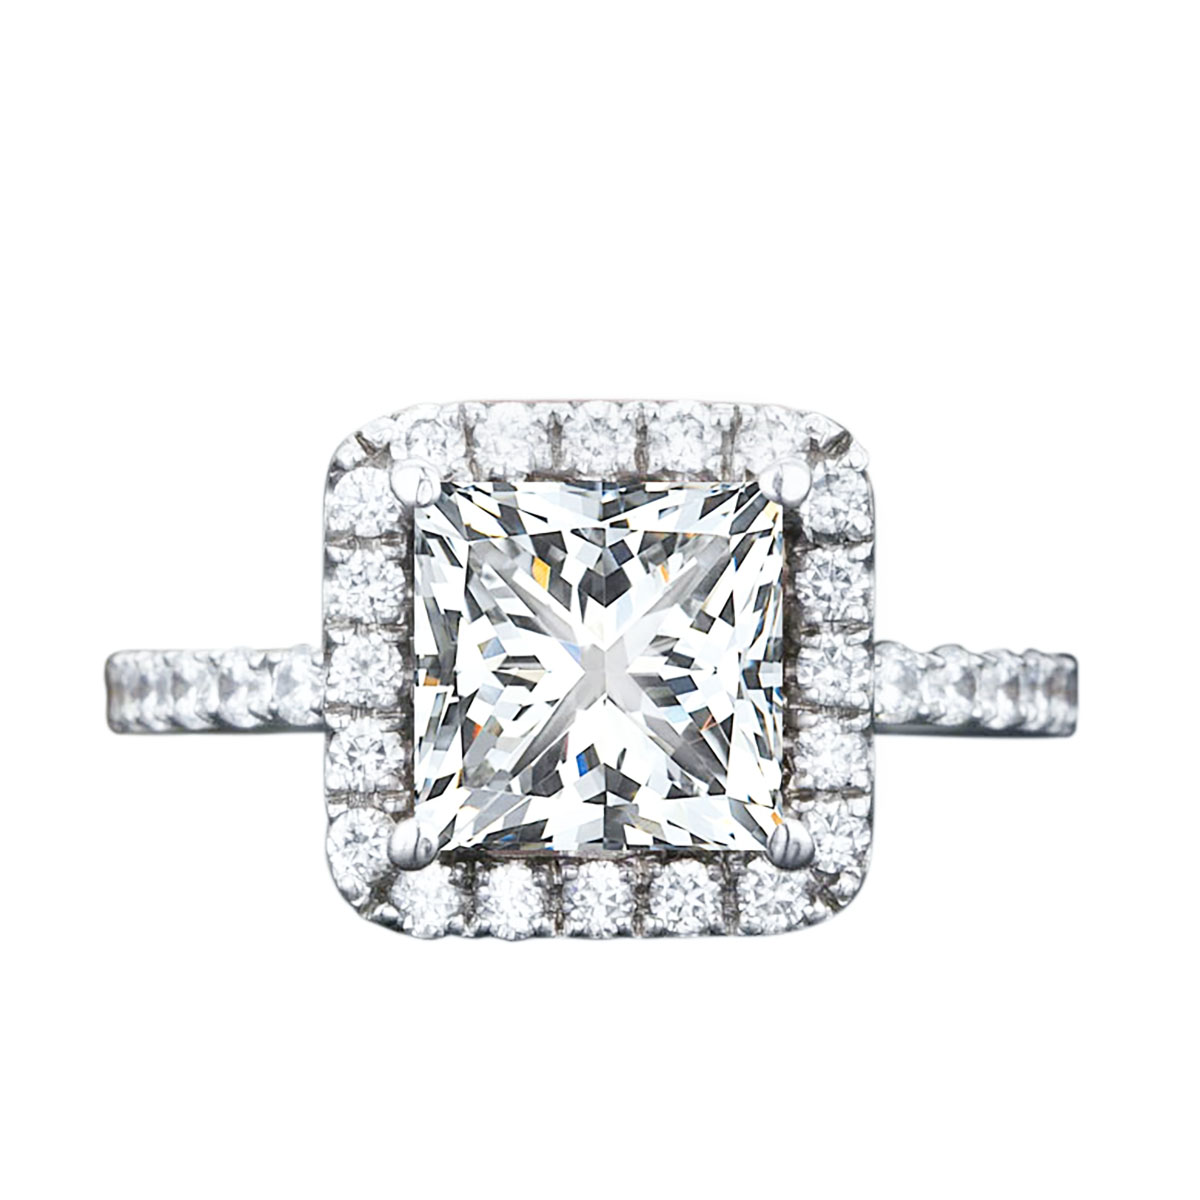 Jeenmata 2 Carat Princess Cut Moissanite And Diamond Halo Engagement Ring In 10k White Gold Walmart Com Walmart Com